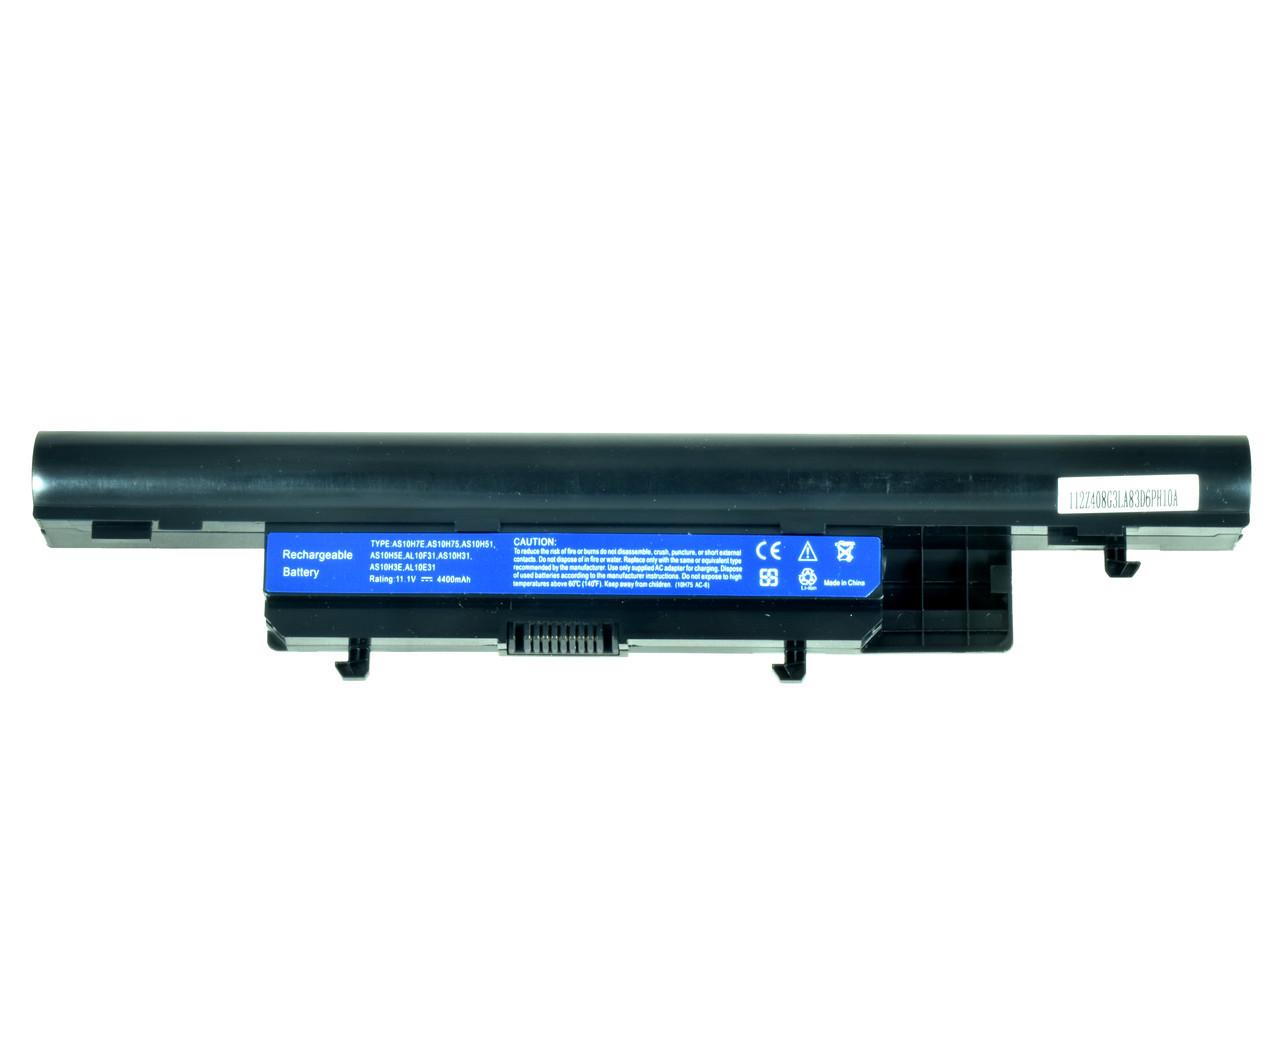 Батарея для ноутбука Gateway AS10H7E 31CR19/65-2 AK.006BT.076 BT.00603.118 BT.00603.119 BT.00605.066